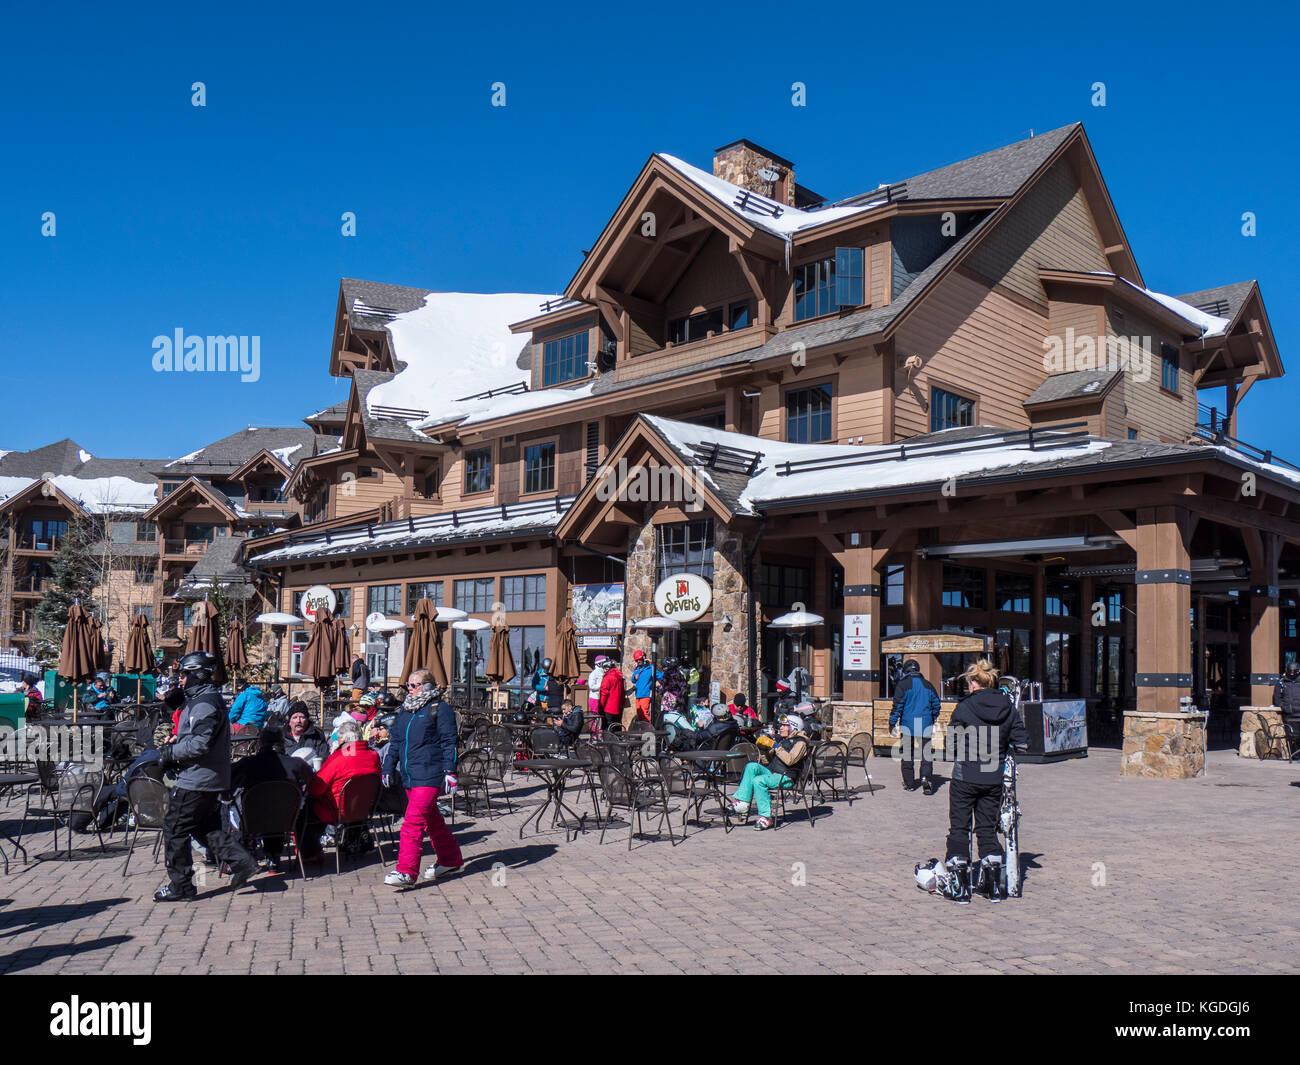 Afternoon outside Sevens, Peak 7 base area, winter, Breckenridge Ski Resort, Breckenridge, Colorado. - Stock Image